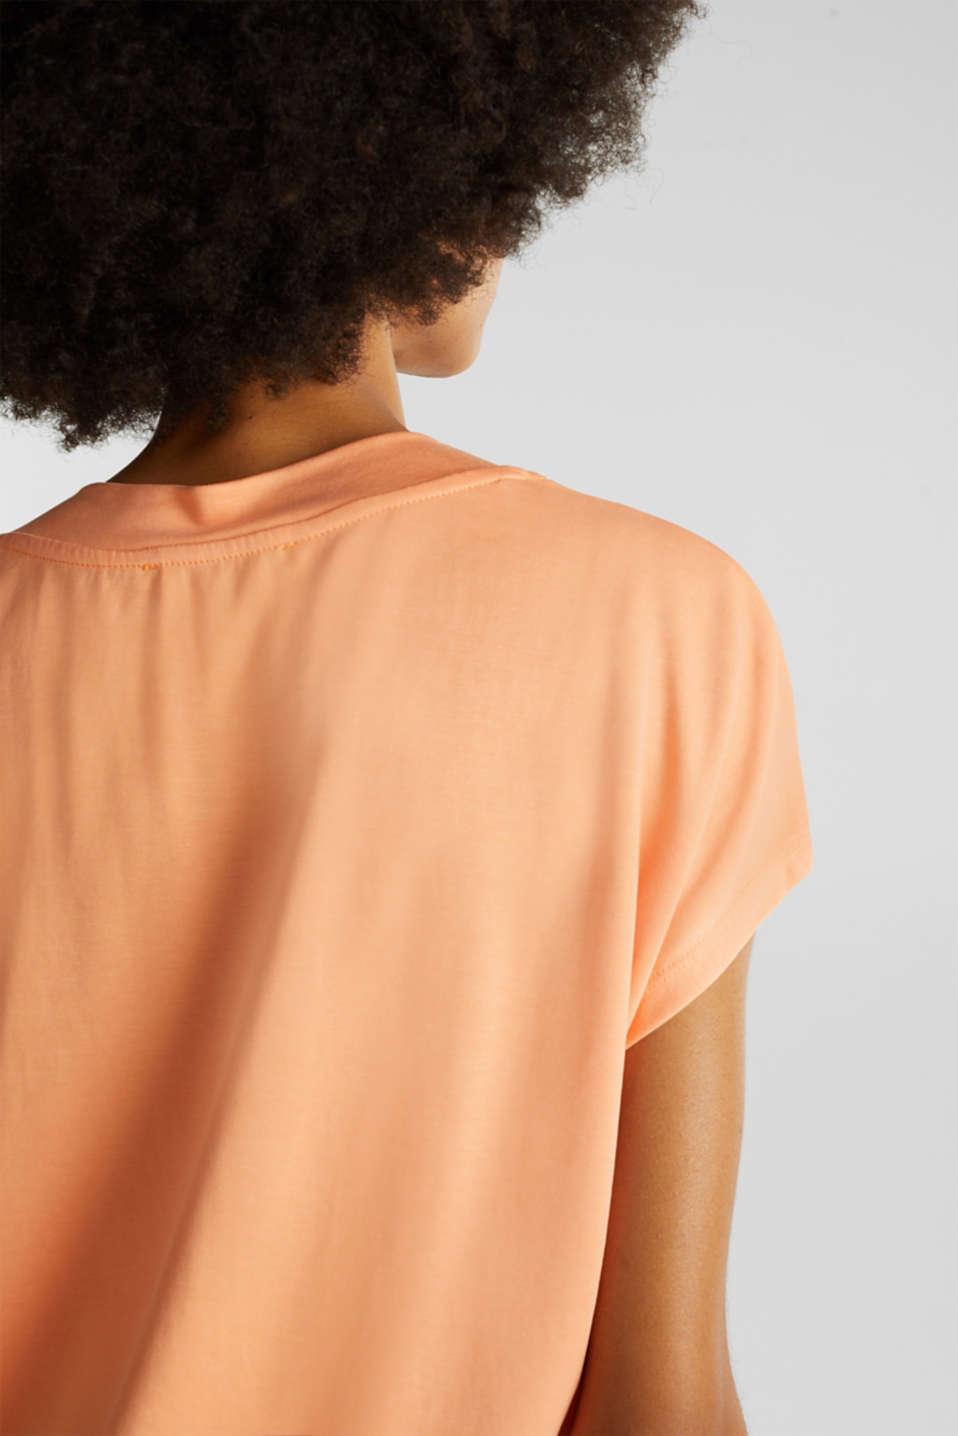 Piqué top with a wide neckline trim, ORANGE, detail image number 4